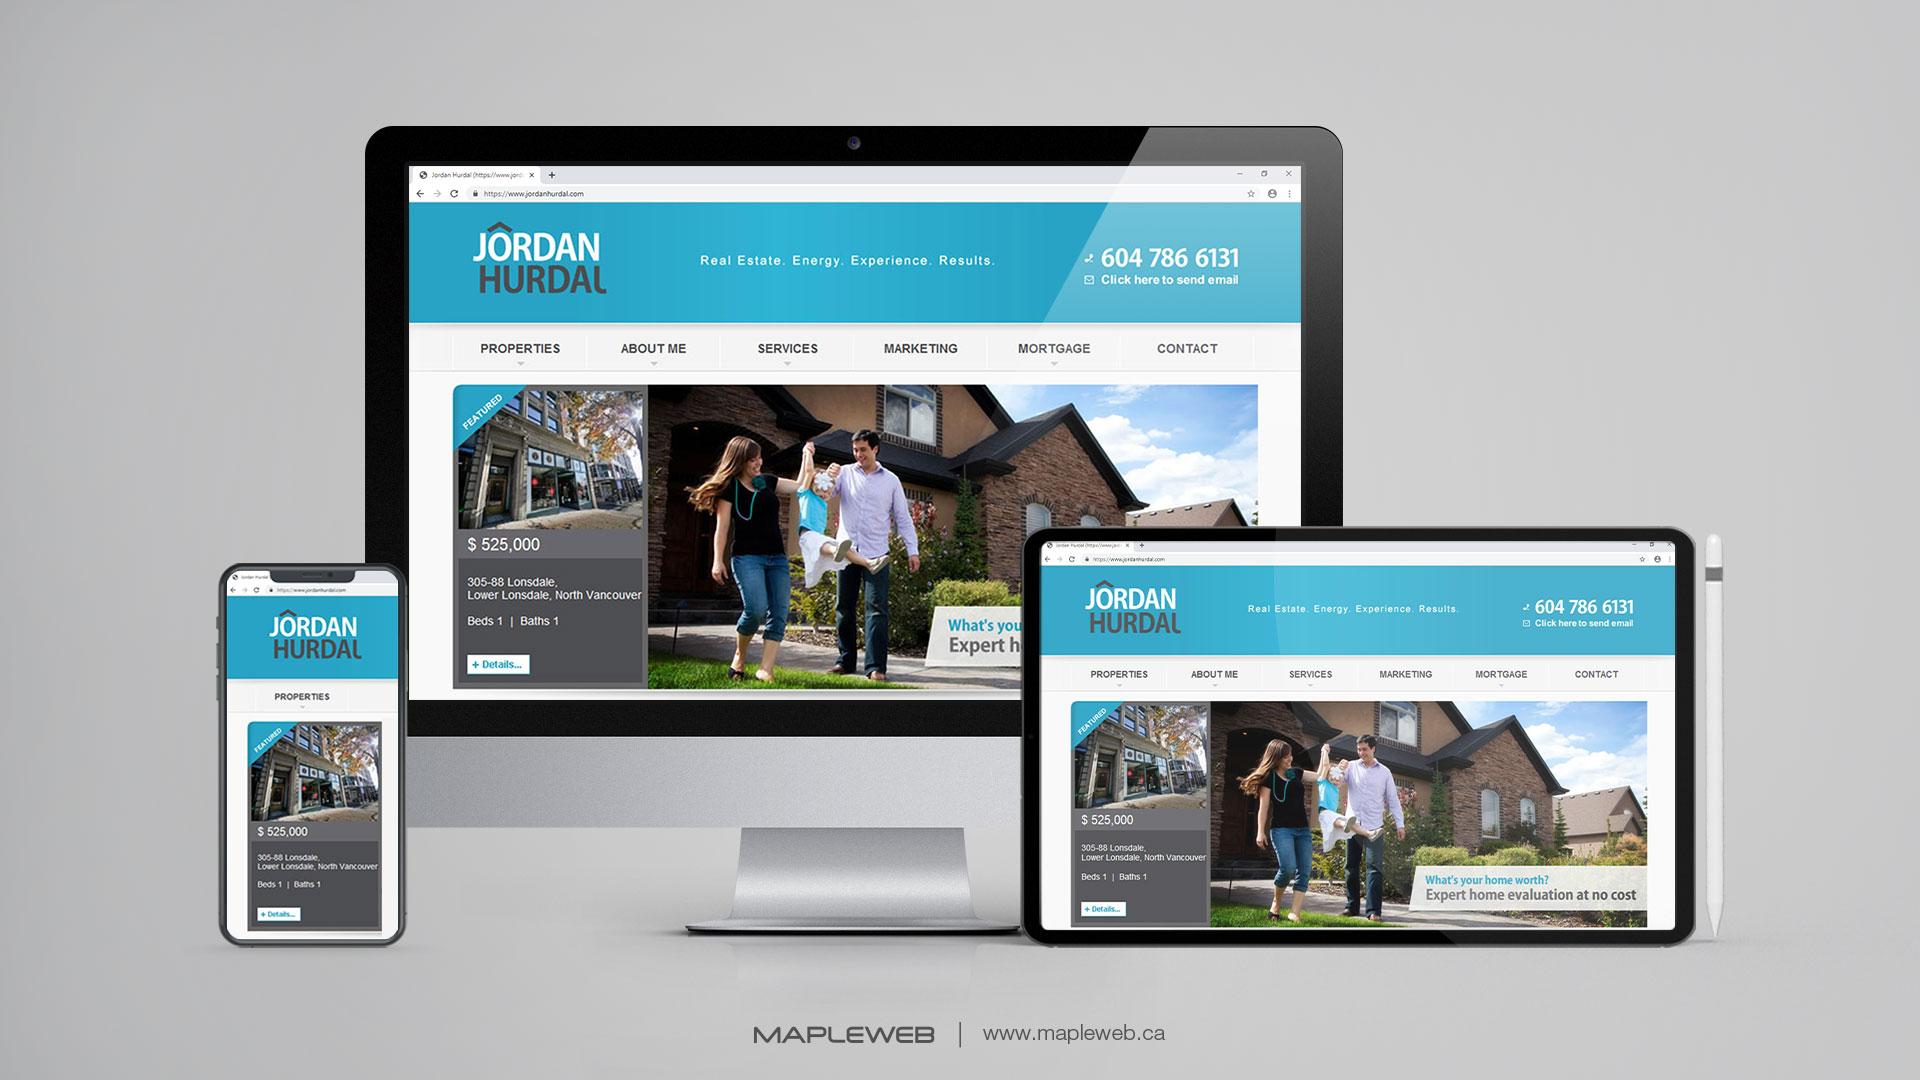 jordan-hurdal-Vancouver-web-design-Vancouver-web-development-by-mapleweb-canada-multiple-devices-display